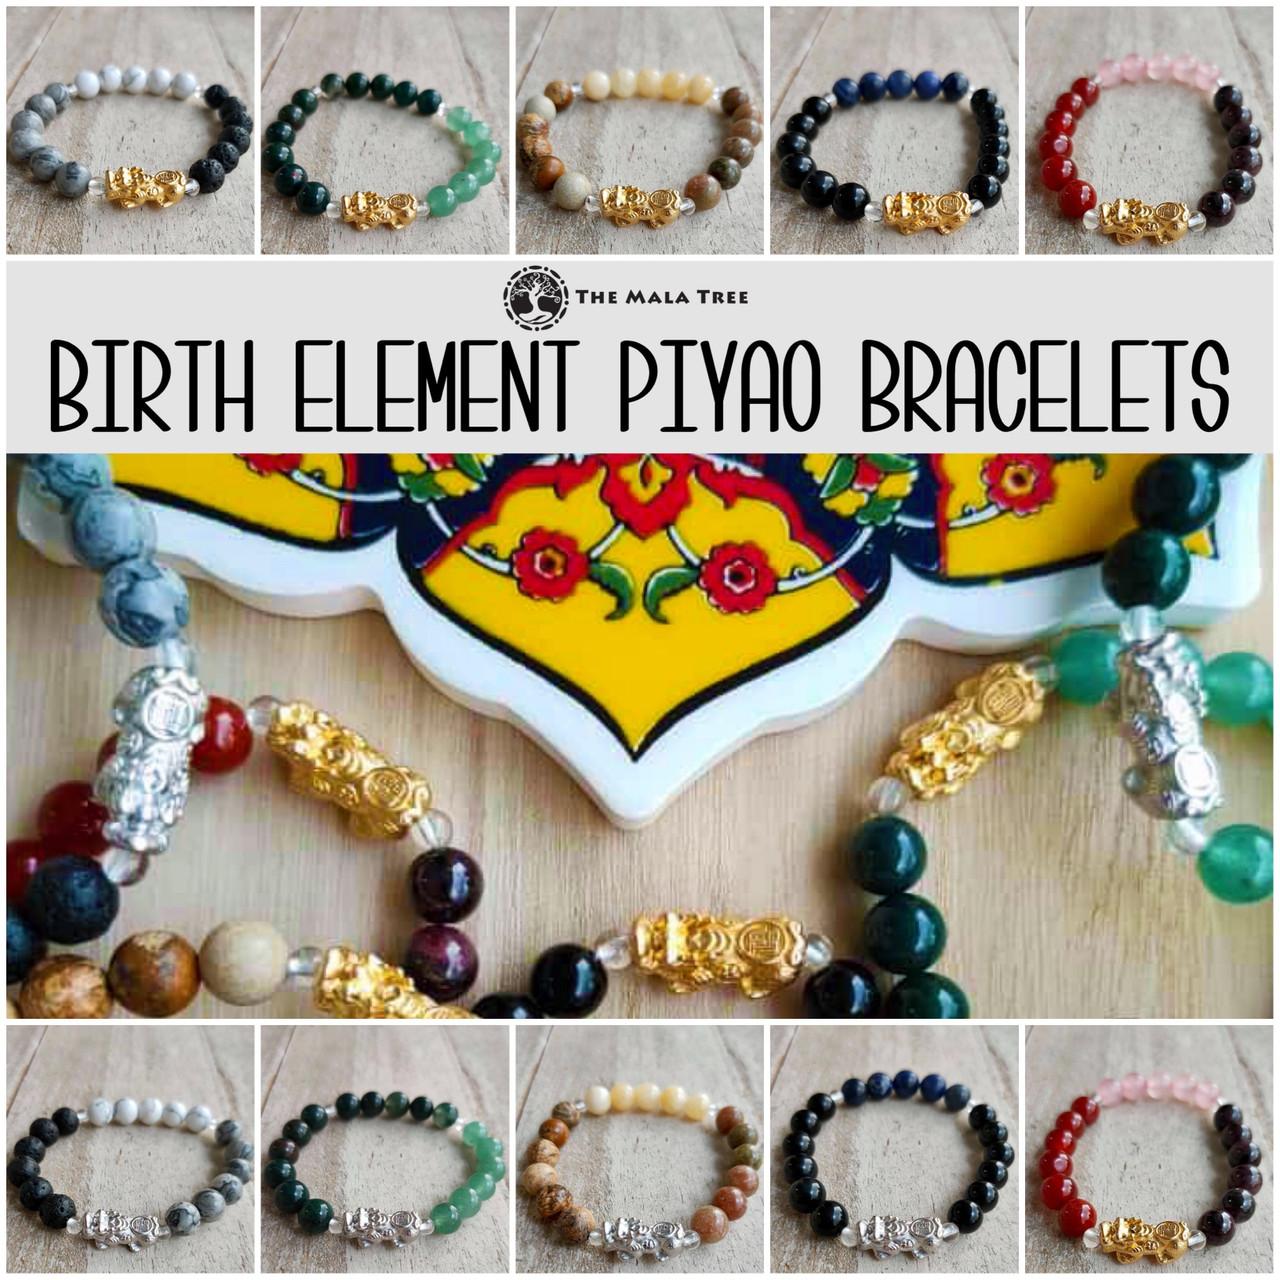 BIRTH ELEMENT PIYAO BRACELETS